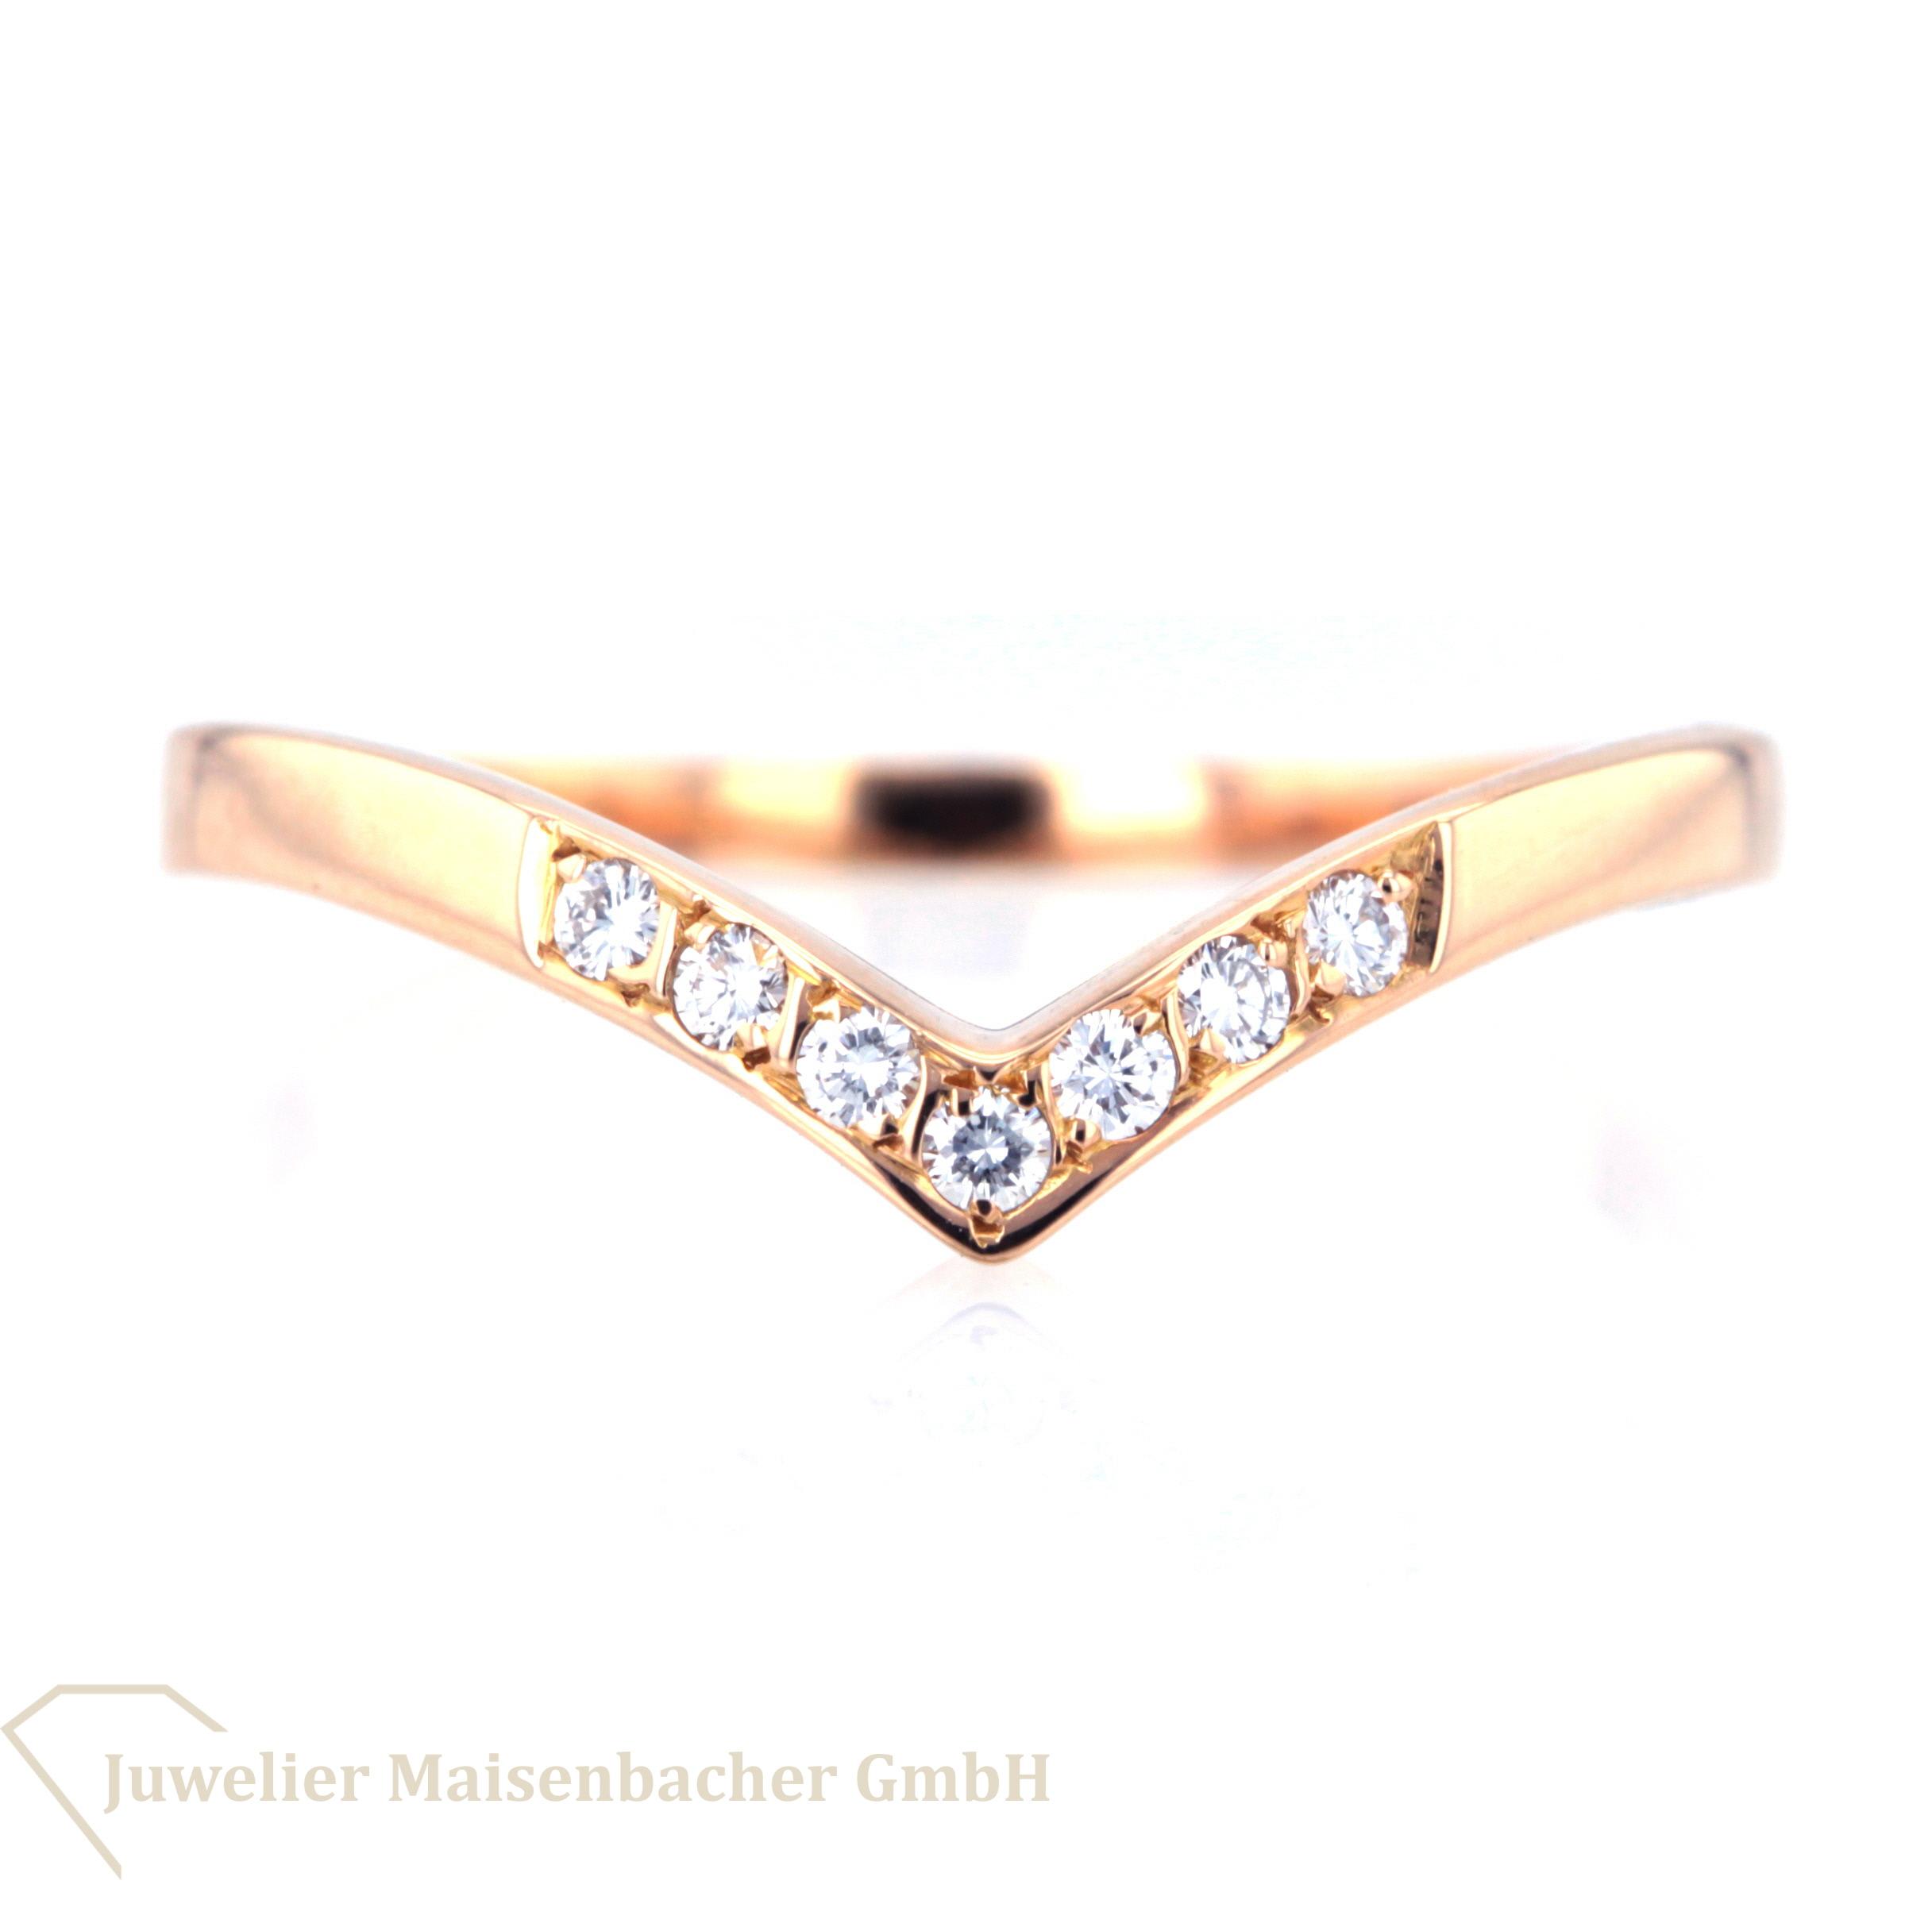 Diamantring rosegold  Diamantring 750 Roségold mit 7 Diamanten | Juwelier Maisenbacher